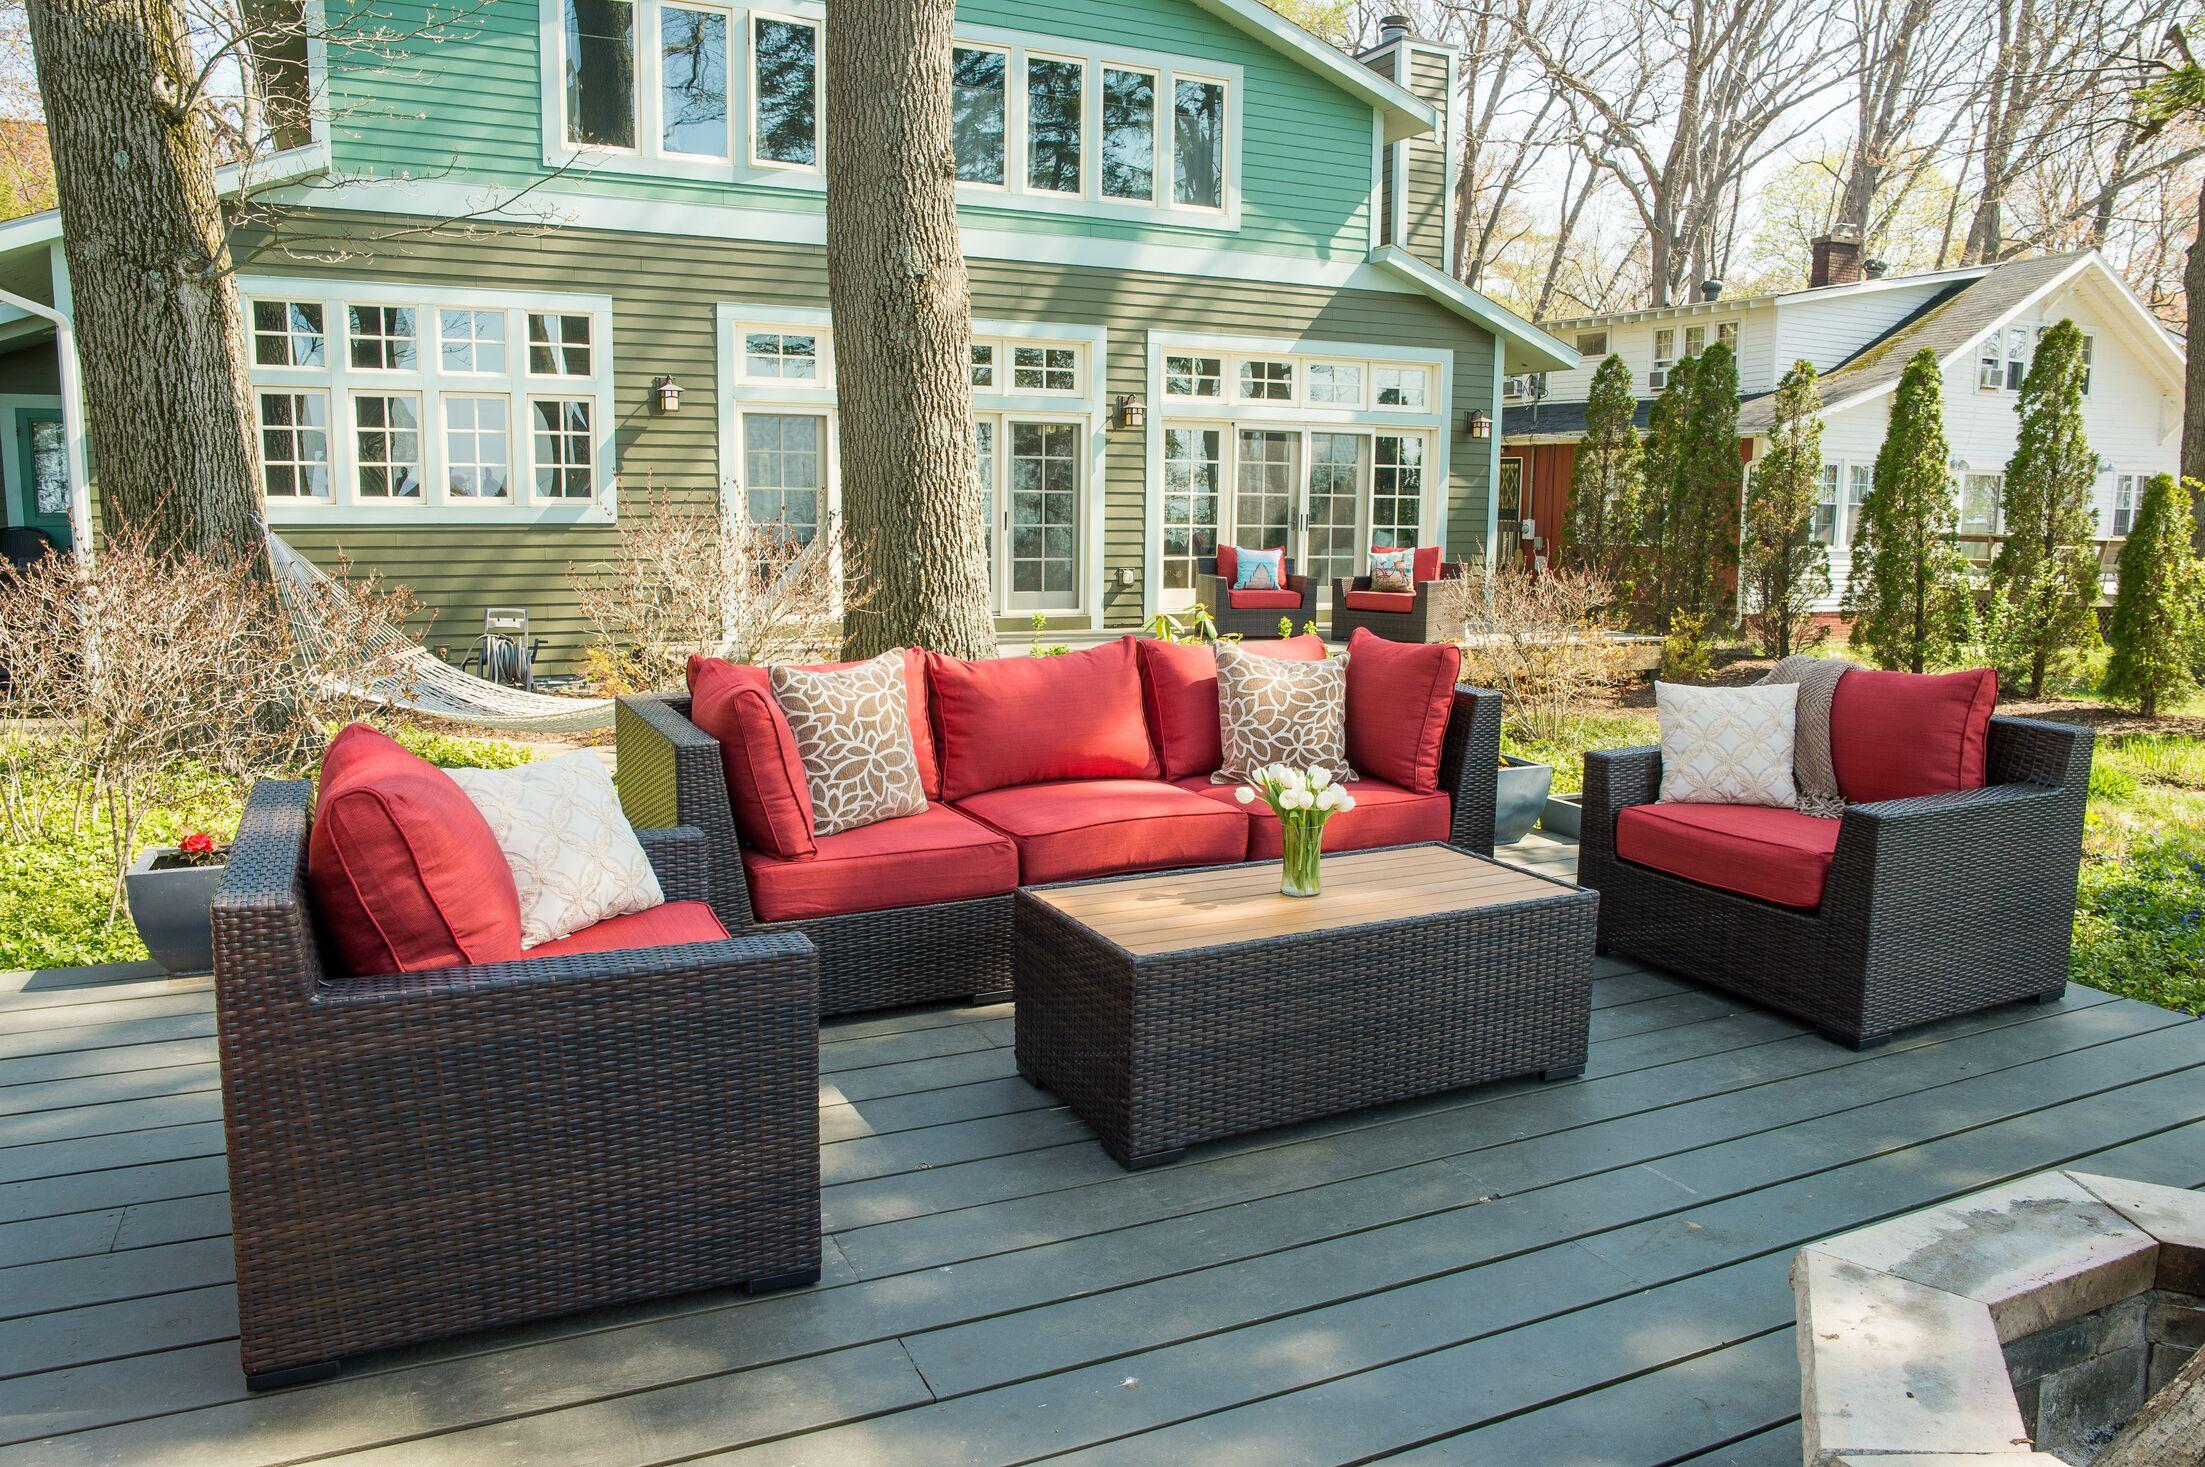 Darden 6 Piece Rattan Sofa Seating Group with Cushions Cushion Color: Regatta